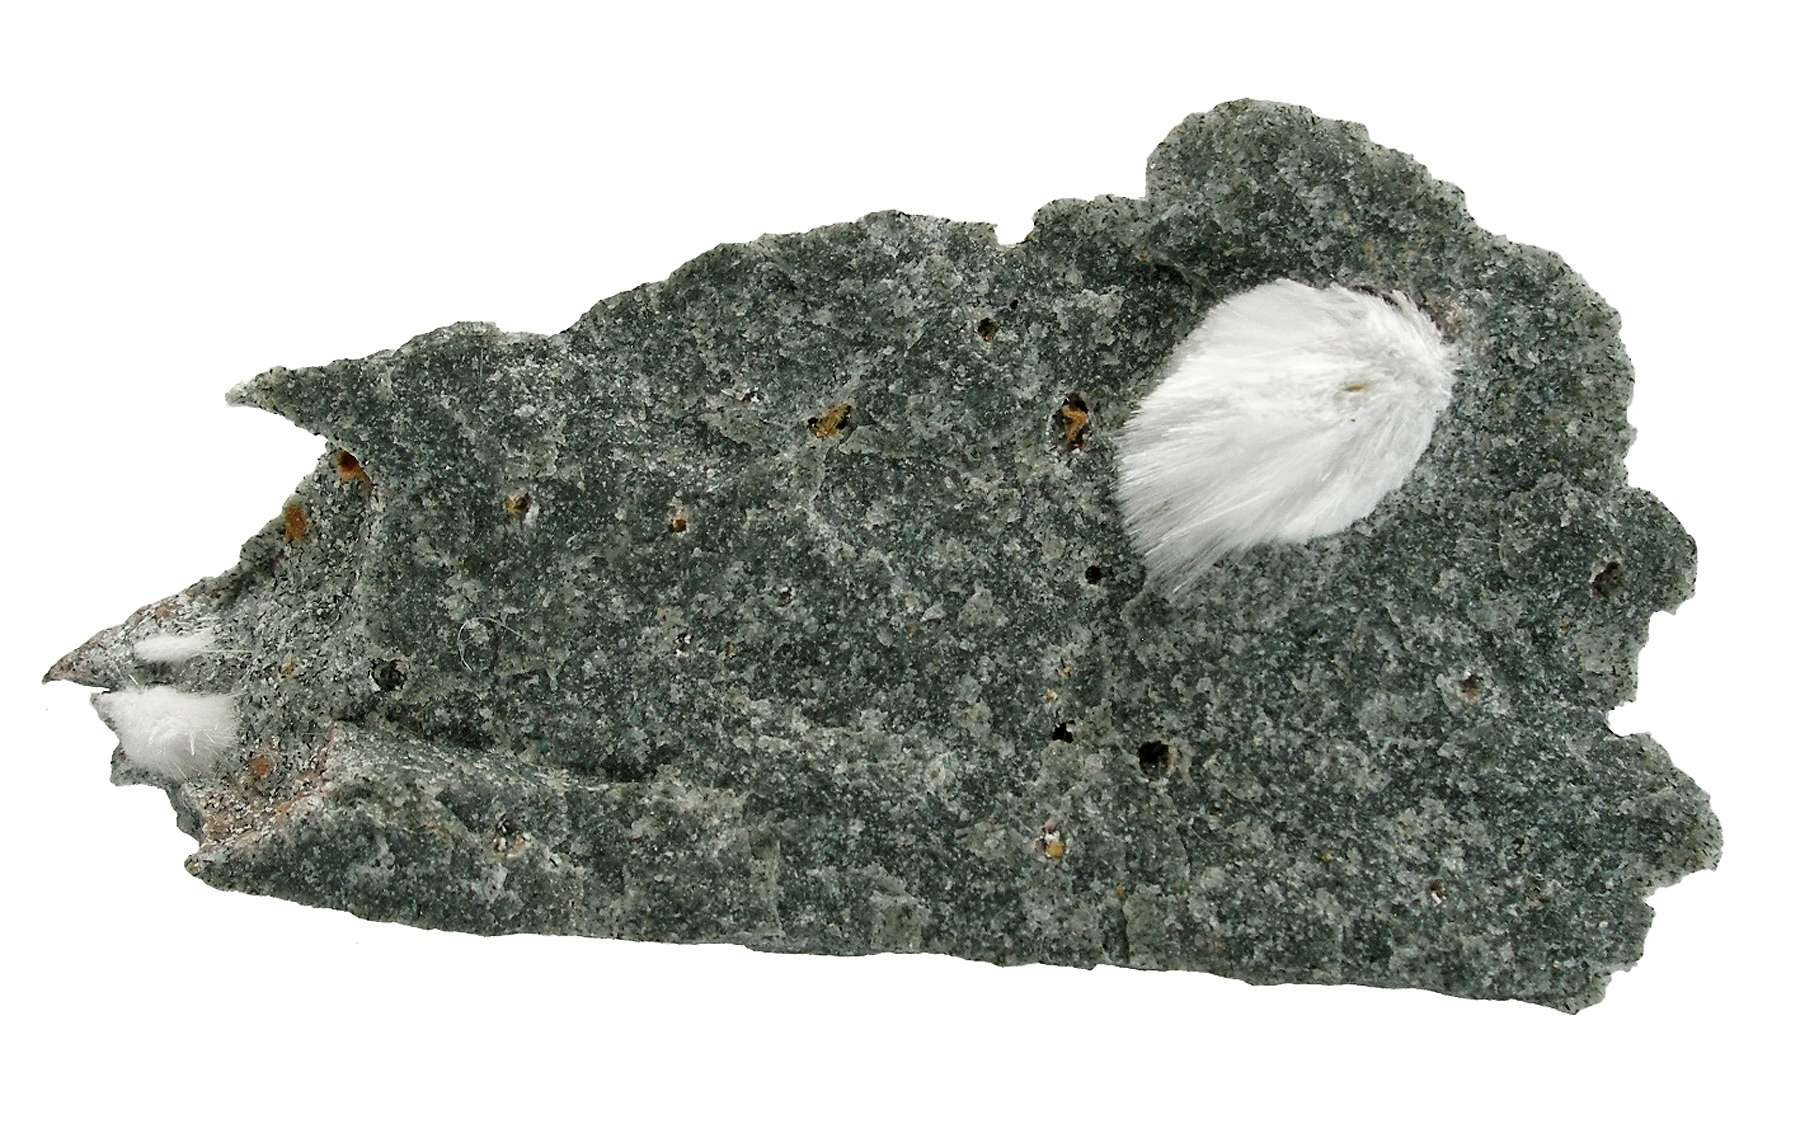 A fine 1 6 cm spray acicular crystals rare species Makatite finds